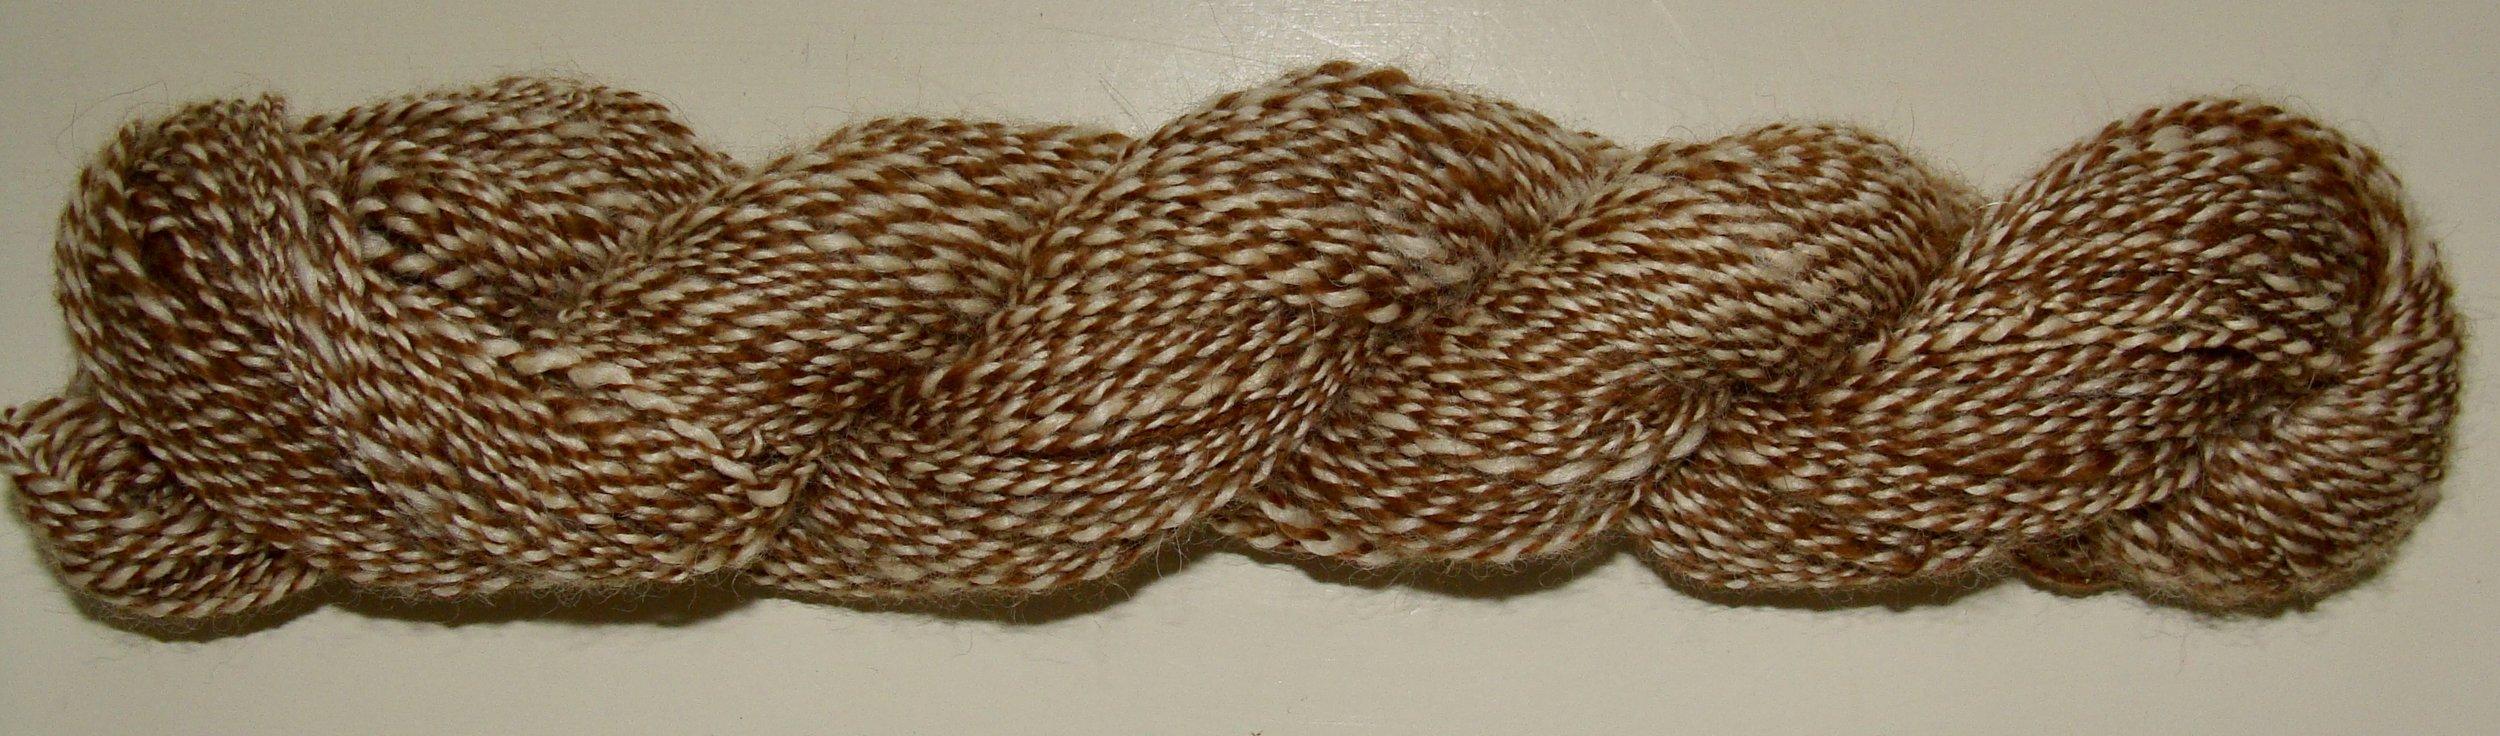 2 ply handspun alpaca yarn